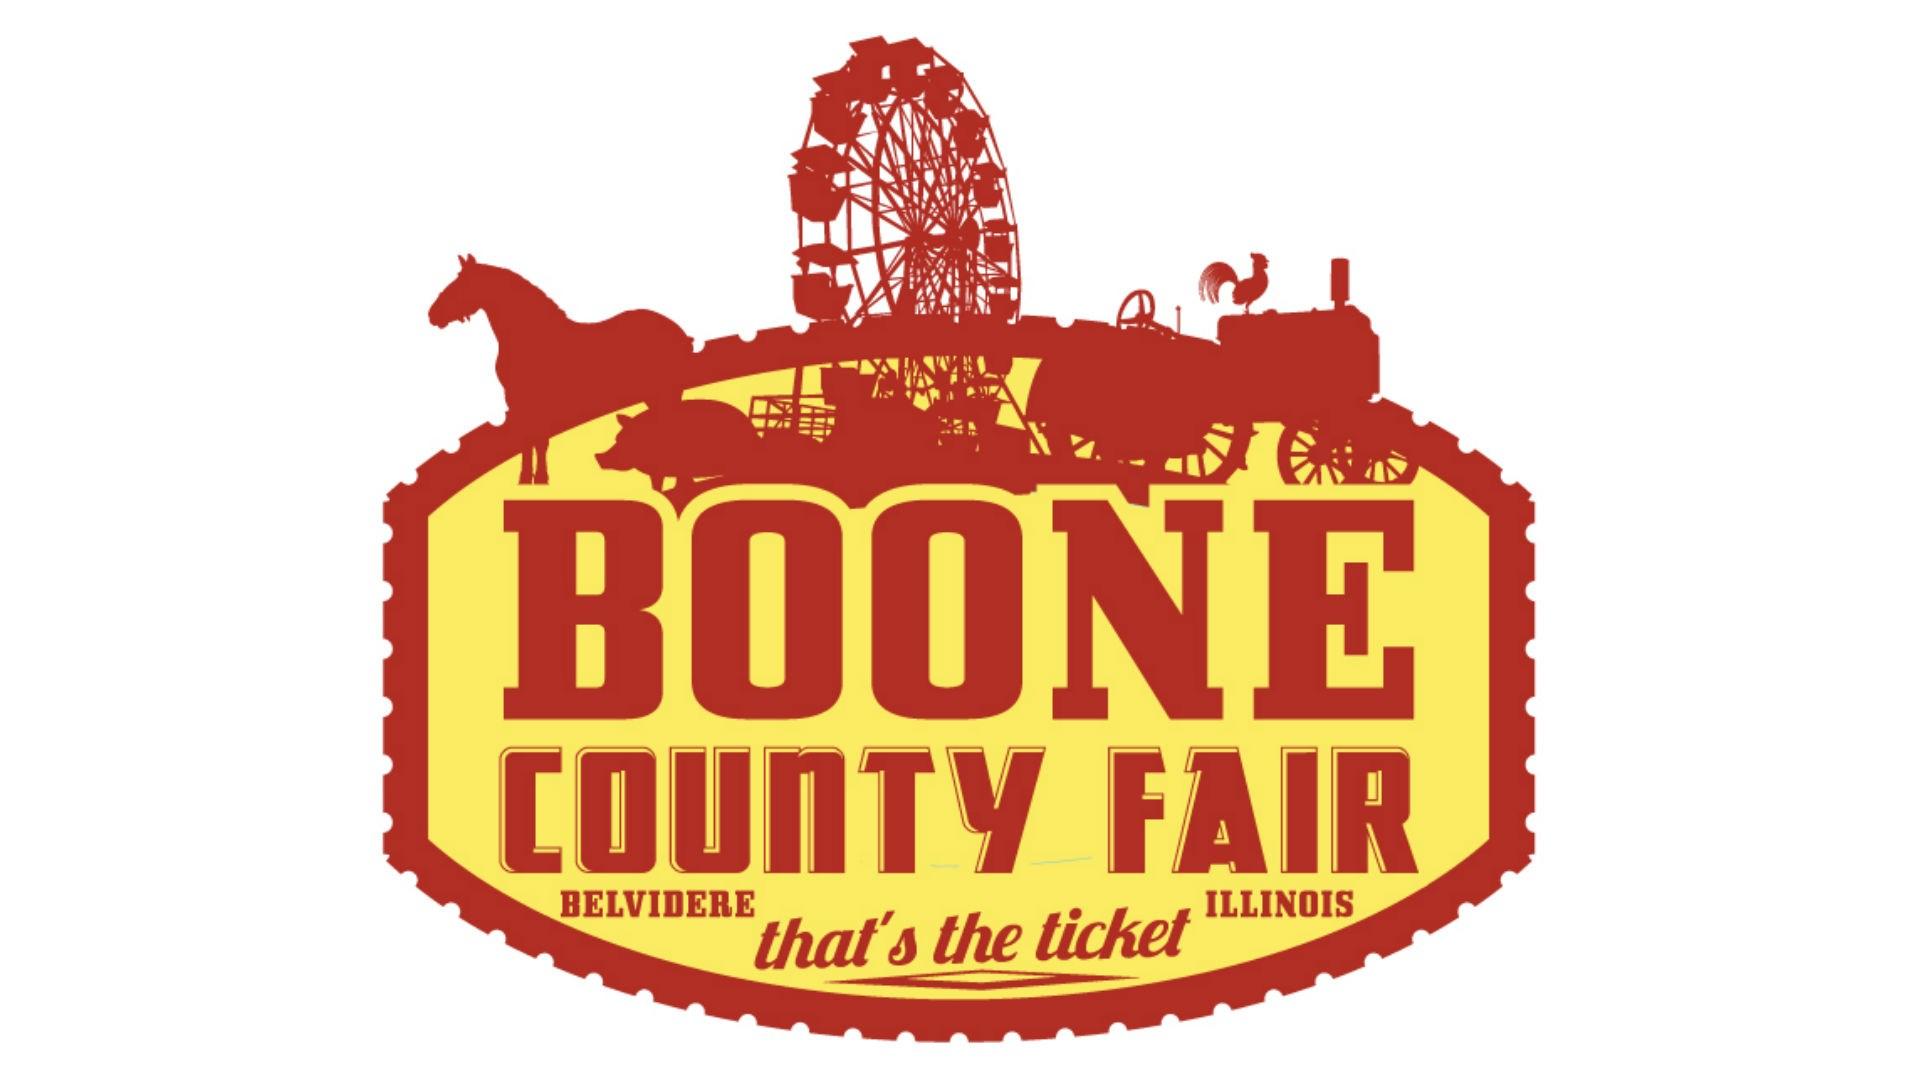 Illinois boone county belvidere - Belvidere Wrex The Boone County